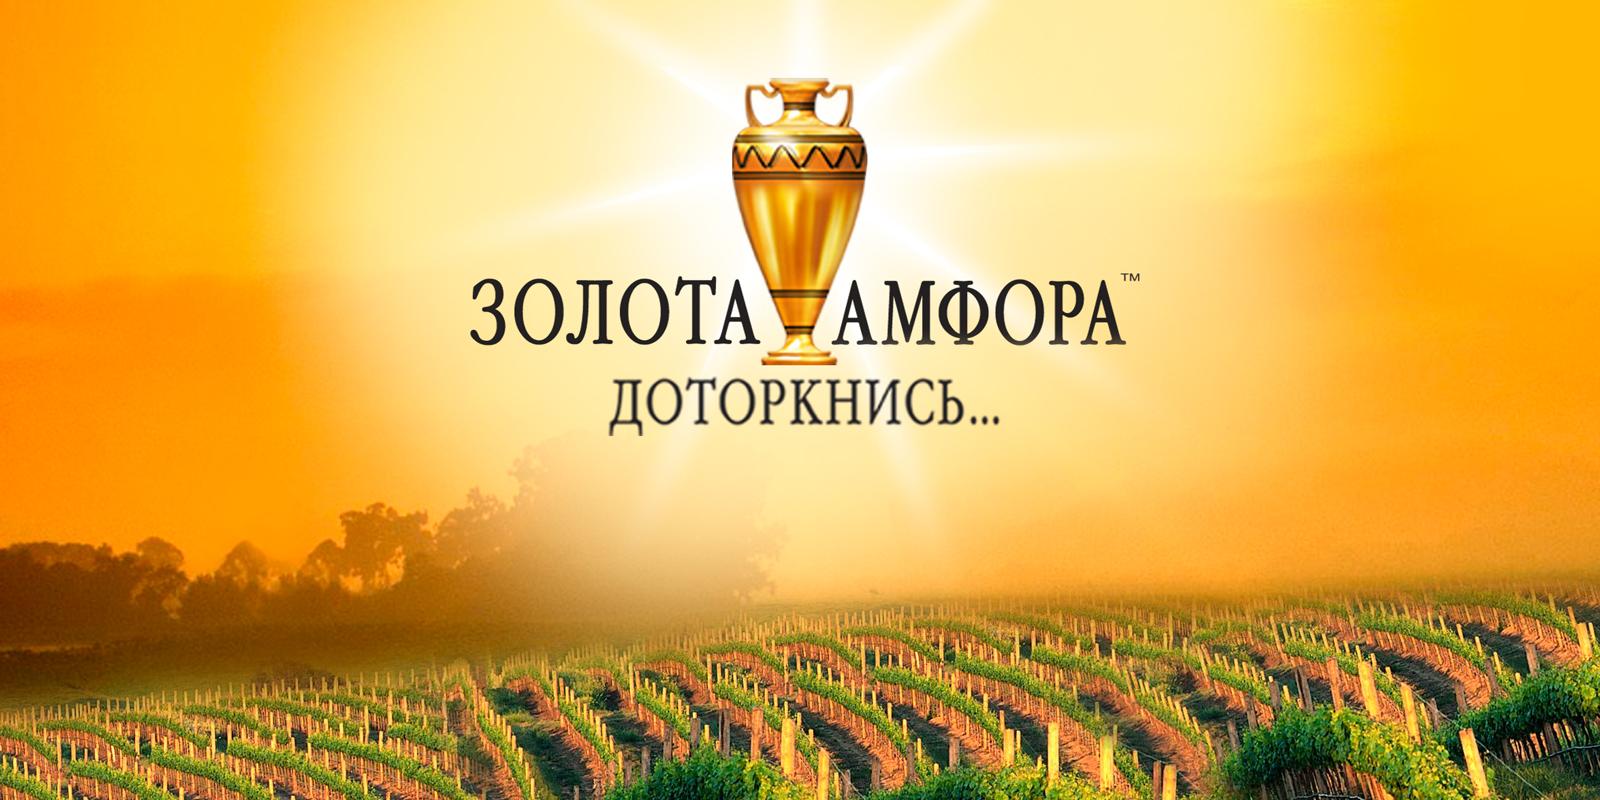 TM «Золотая Амфора»;;;;;;Разработка дизайна логотипа;;;;;;<span>Клиент:</span> Компания «Алеф Виналь»;;;;;;;;;;;;Разработка дизайна логотипа;;;;;;1